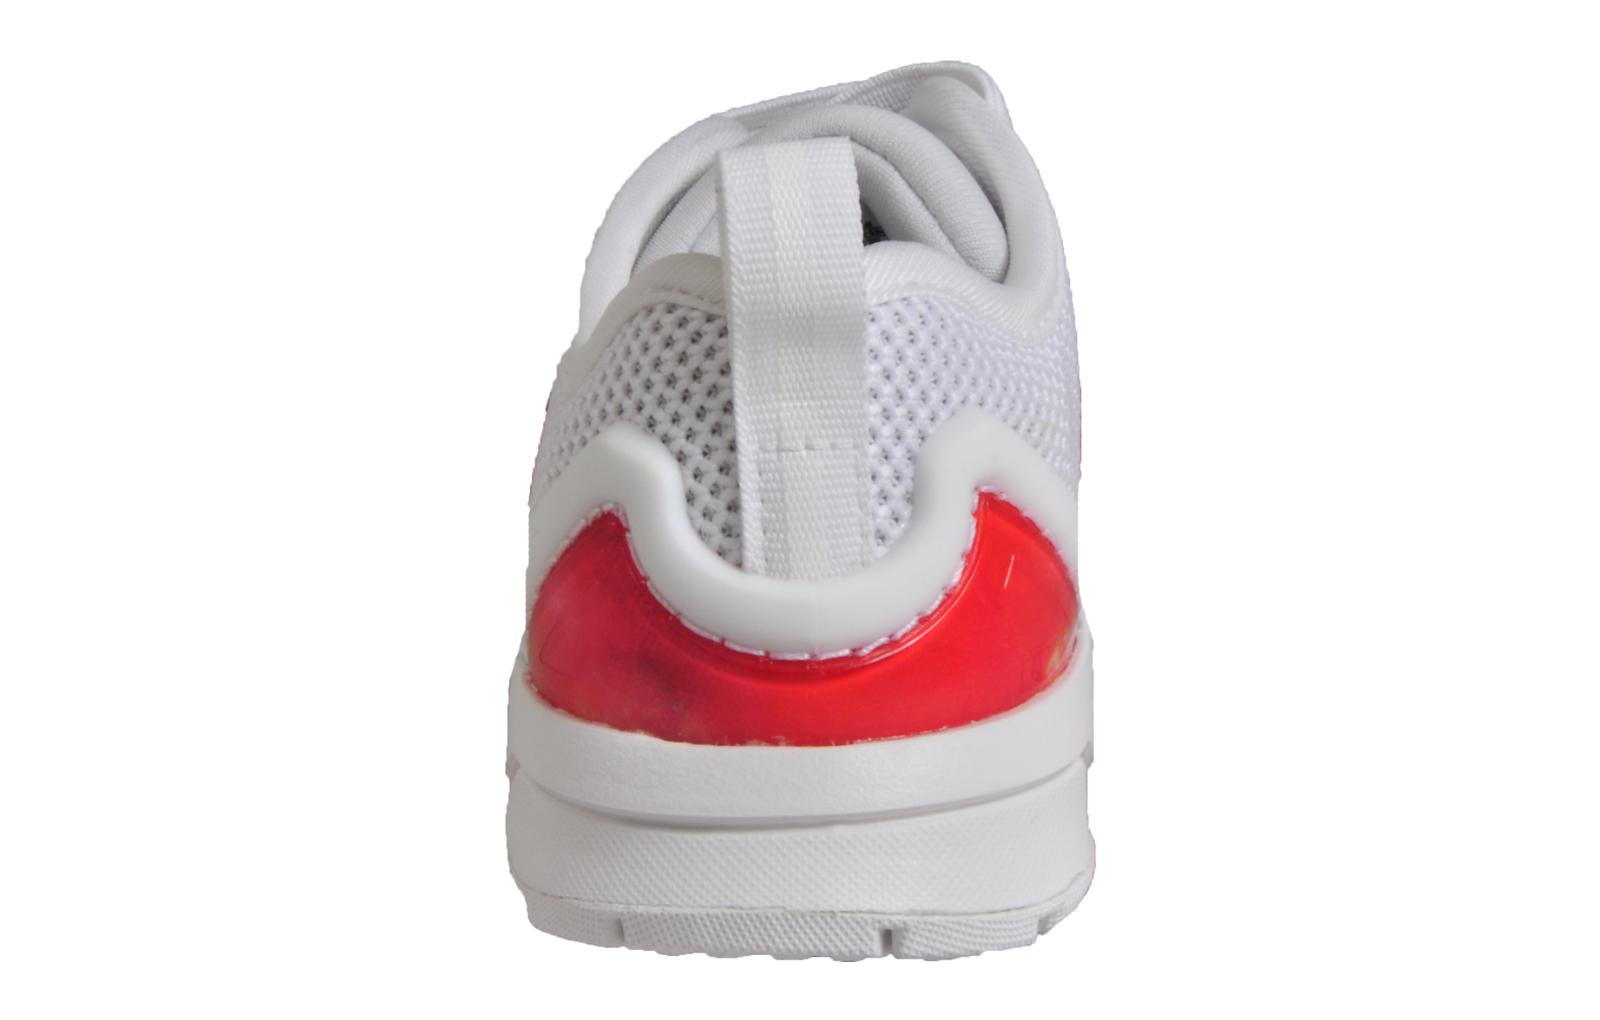 premium selection 9617e 5c34a Adidas Originals ZX Flux EL Infants Babies Toddlers Girls Classic Casual  Trainers White